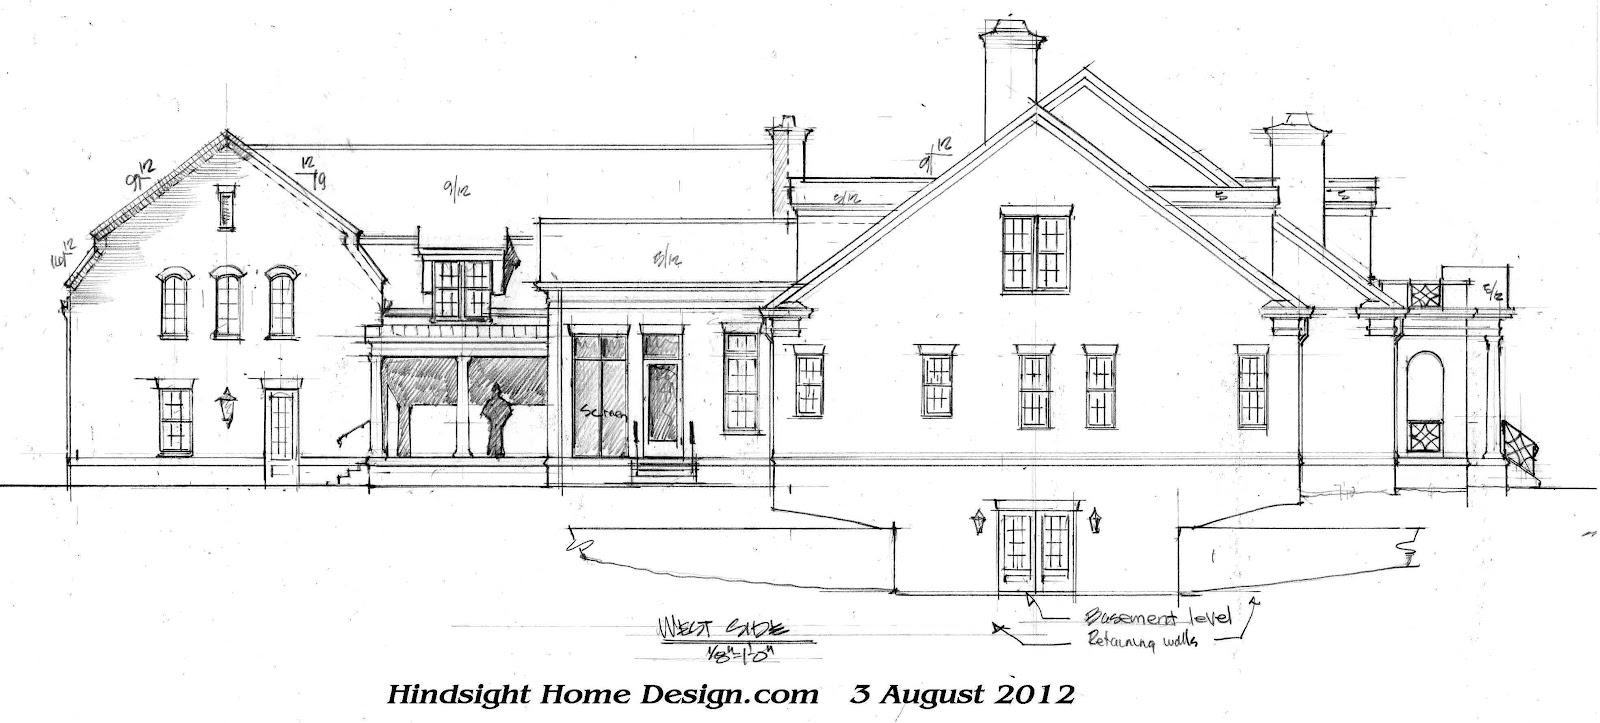 Hindsight home design for Parapet house plans